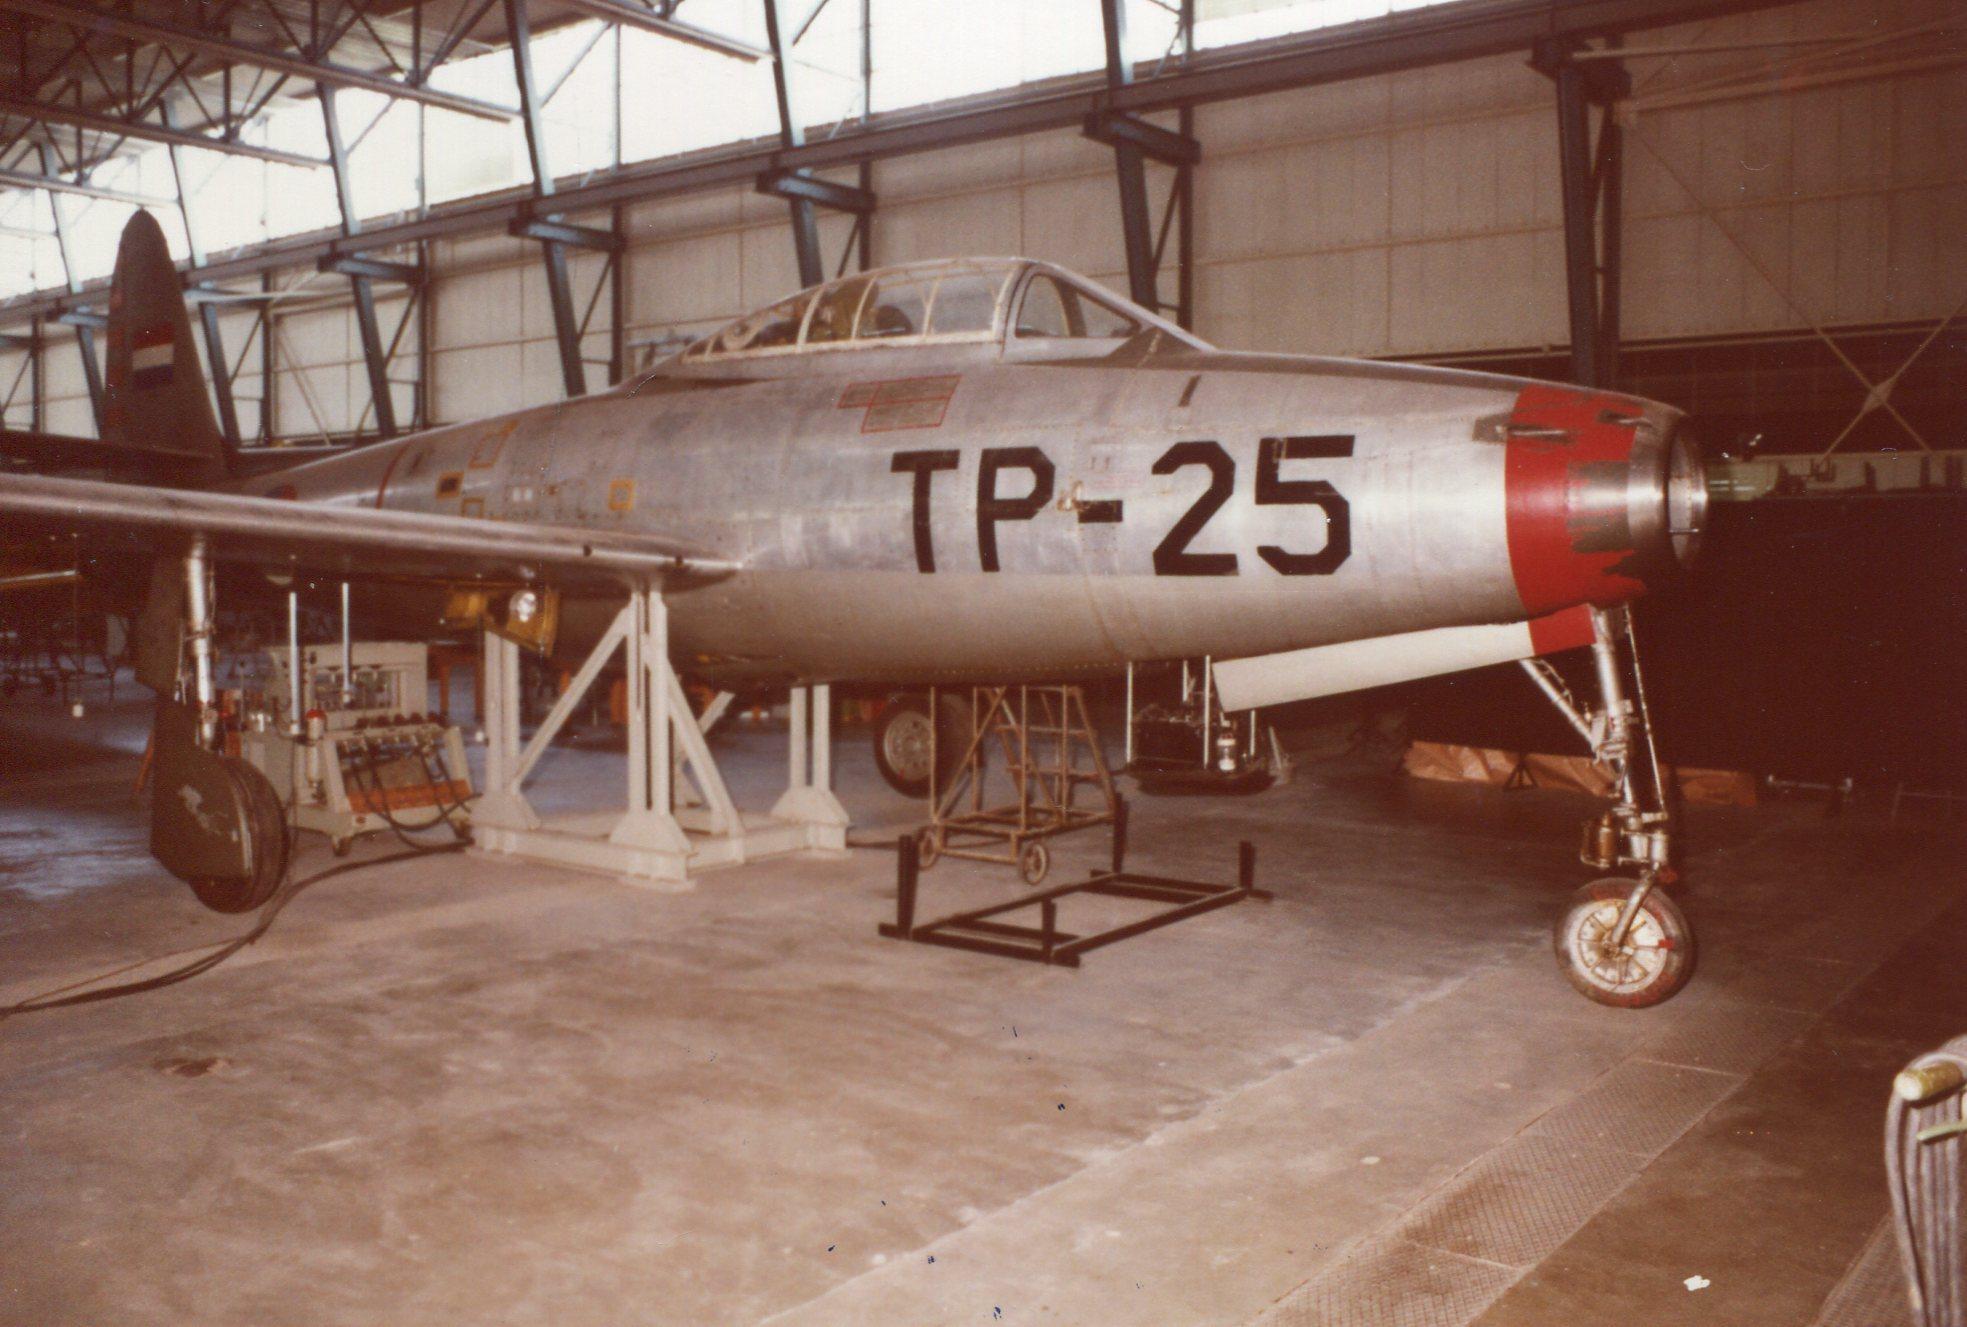 Naam: TH Delft Sept. 1974.jpg Bekeken: 1206 Grootte: 320,9 KB